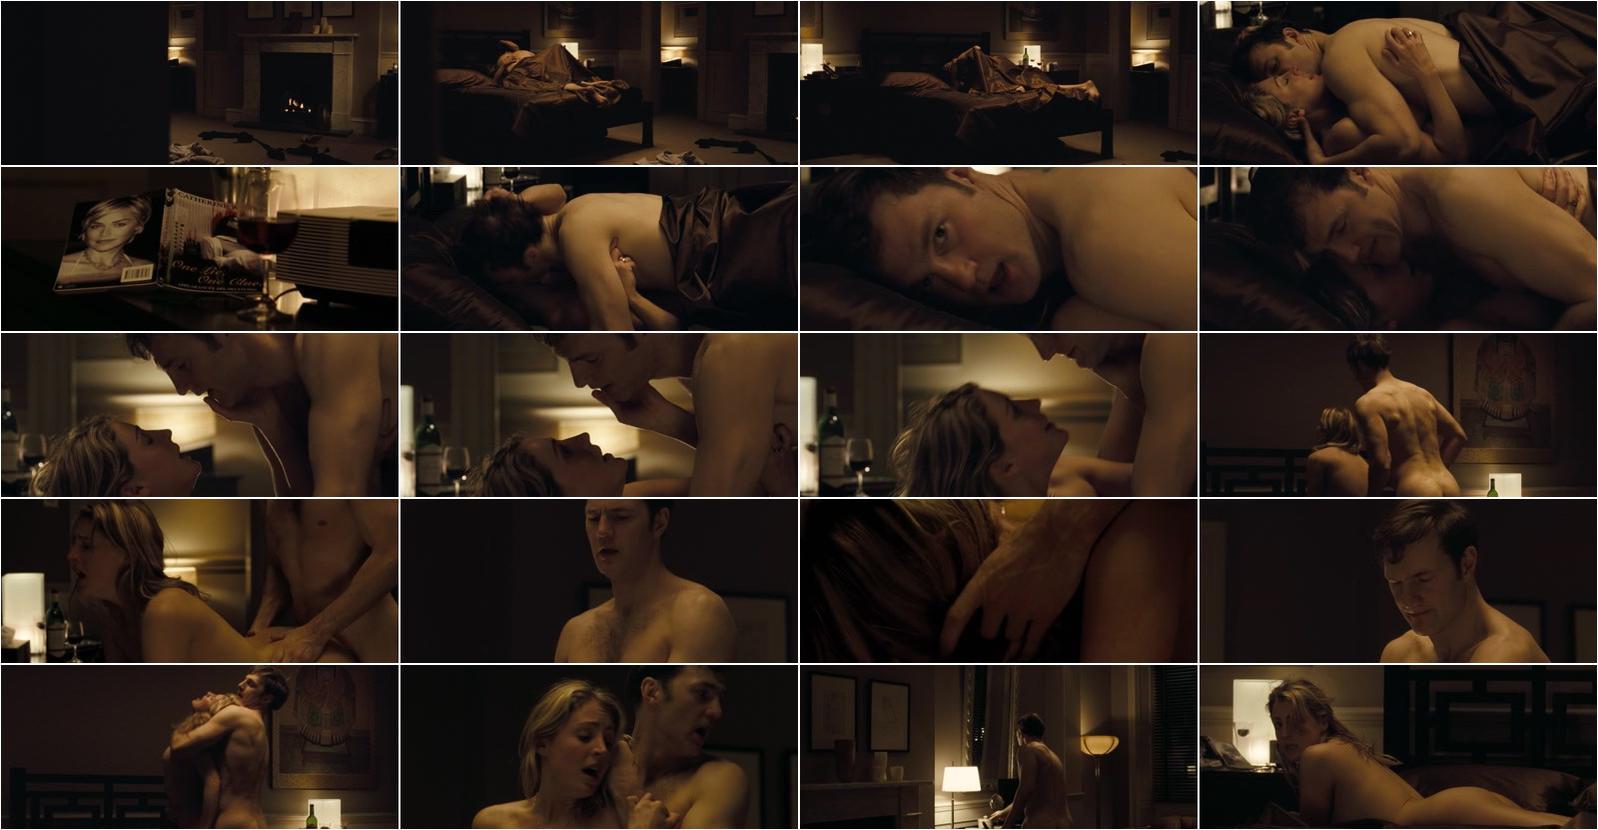 Flora Montgomery nude - Basic Instinct 2 (2006)